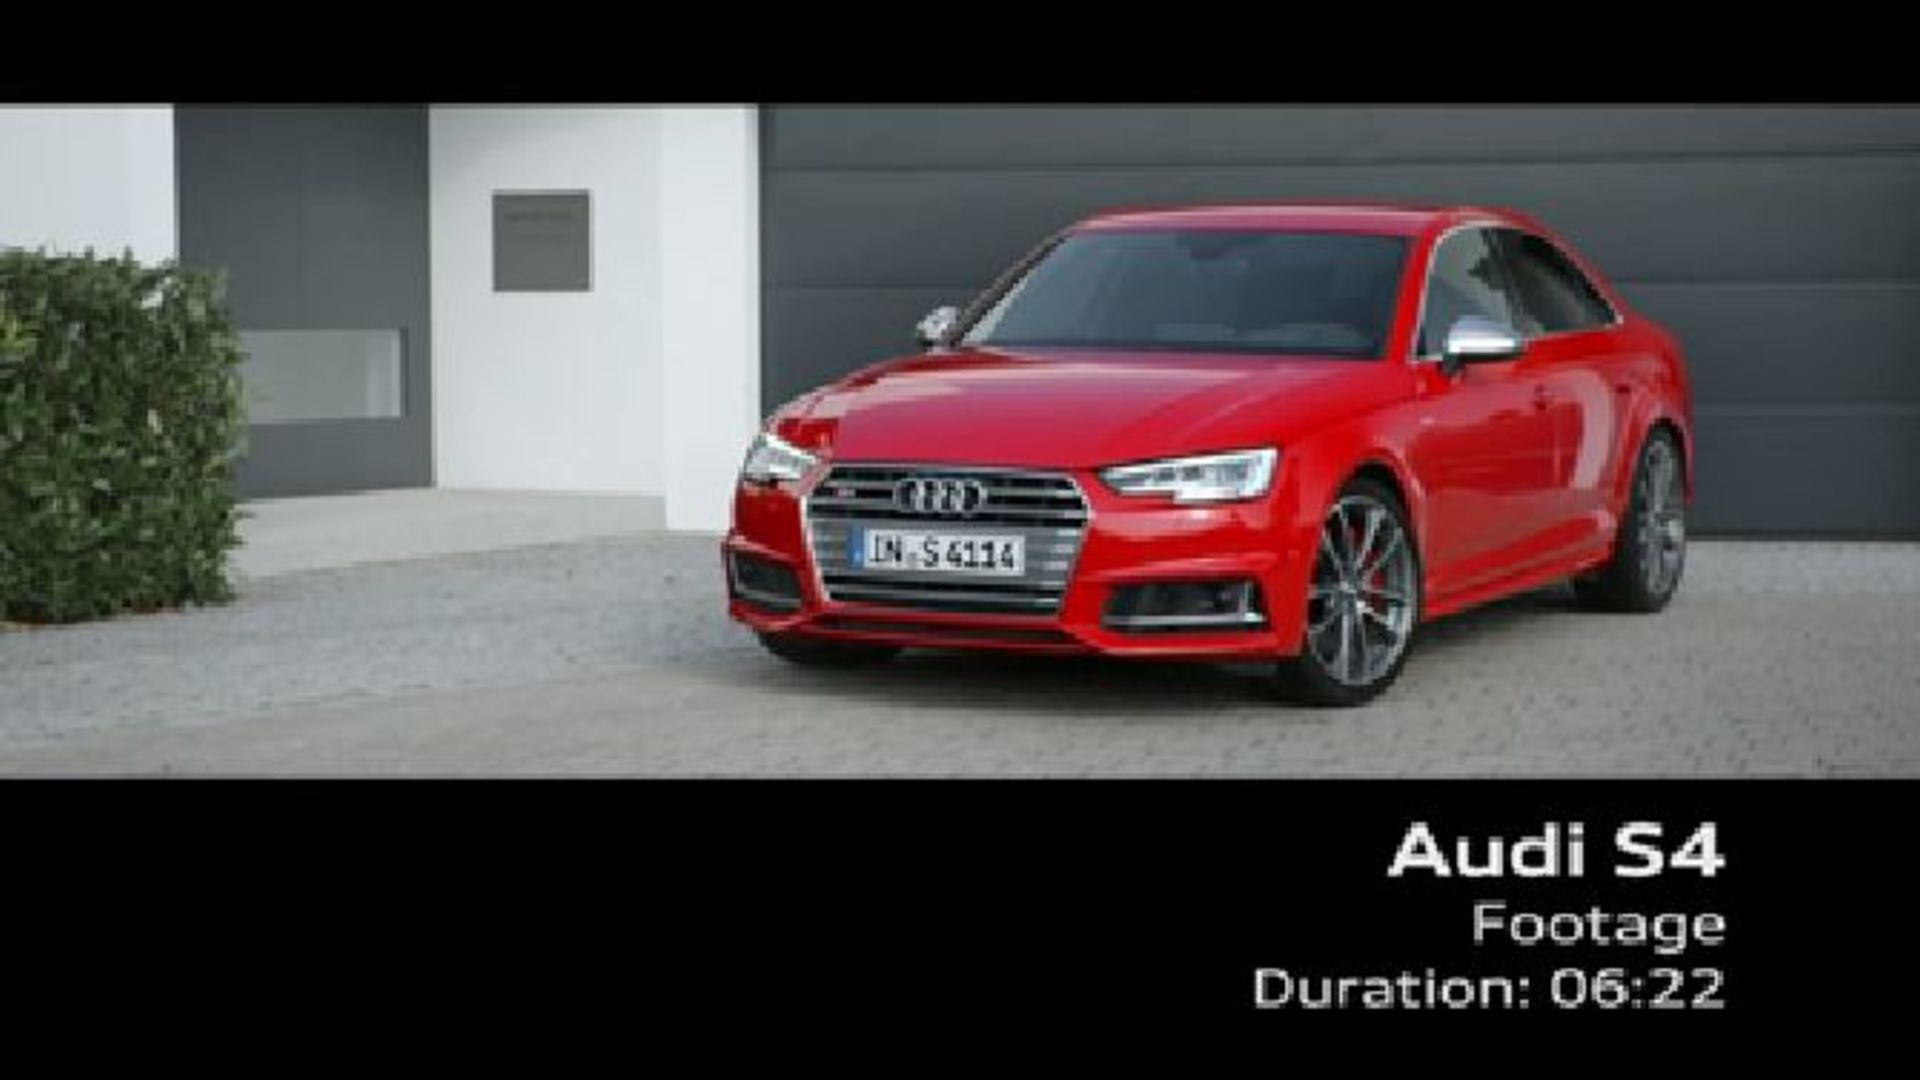 Audi S4 (2016) – Footage